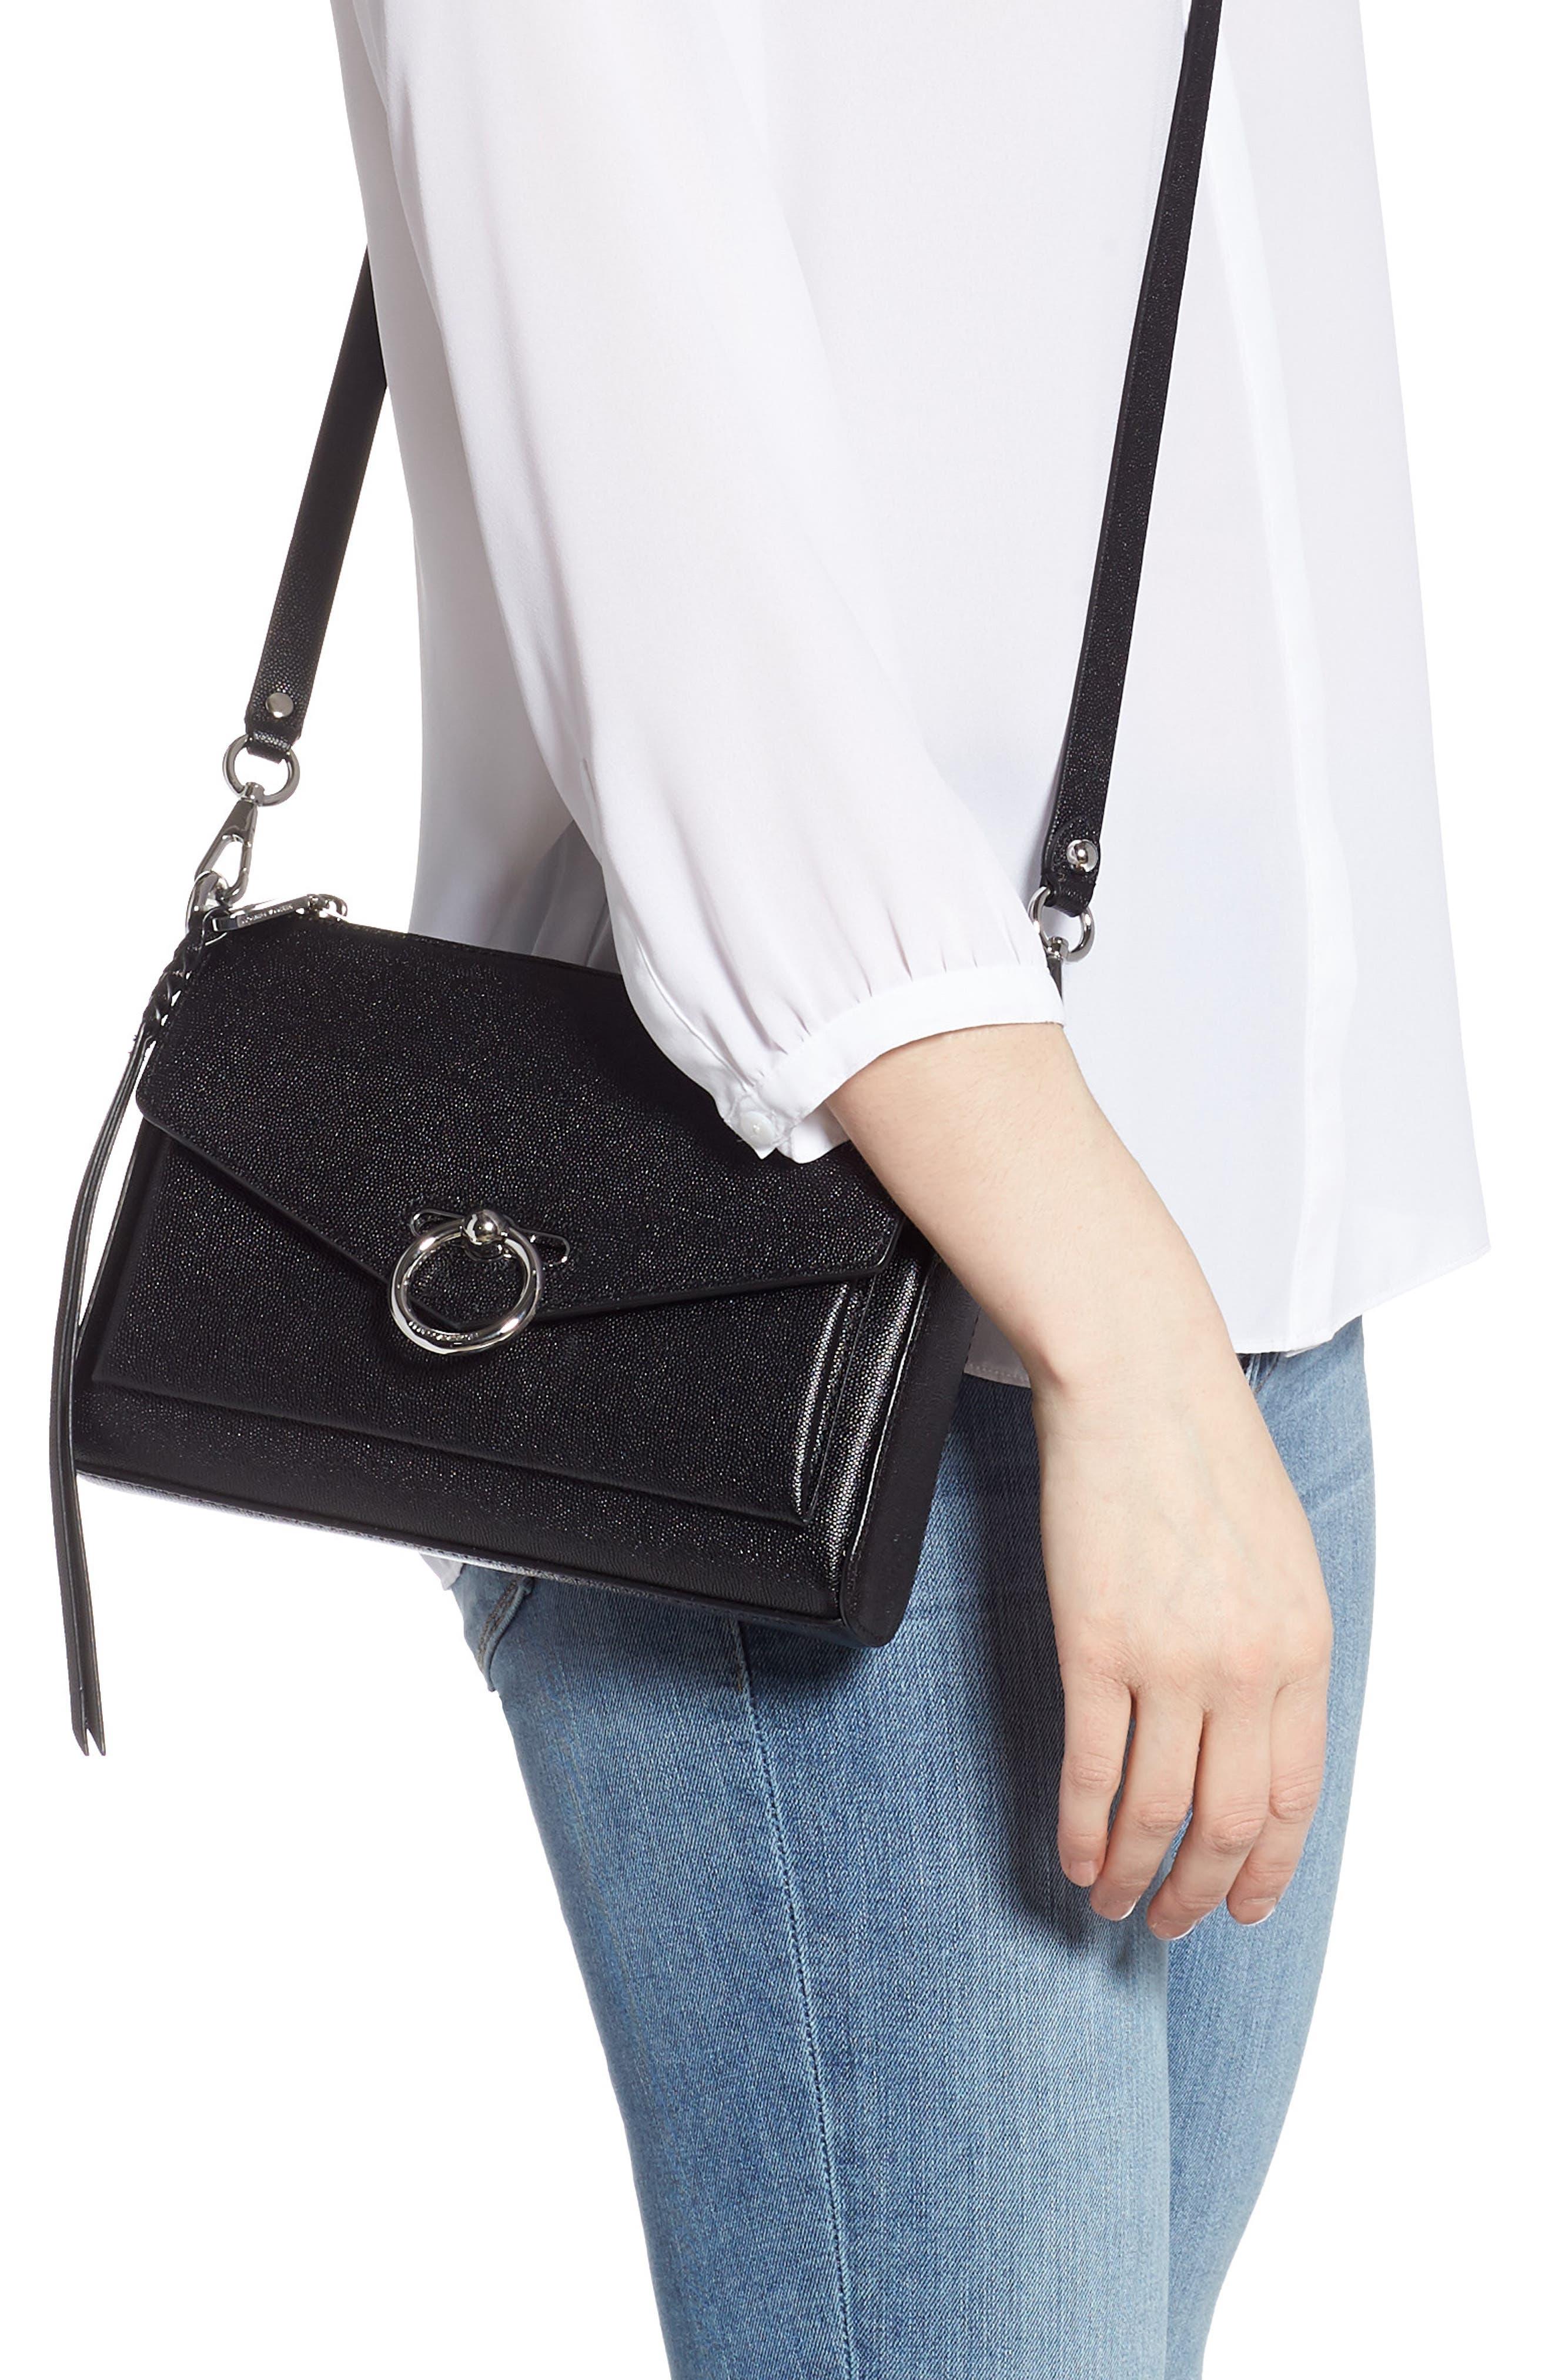 Jean MAC Convertible Crossbody Bag,                             Alternate thumbnail 2, color,                             BLACK